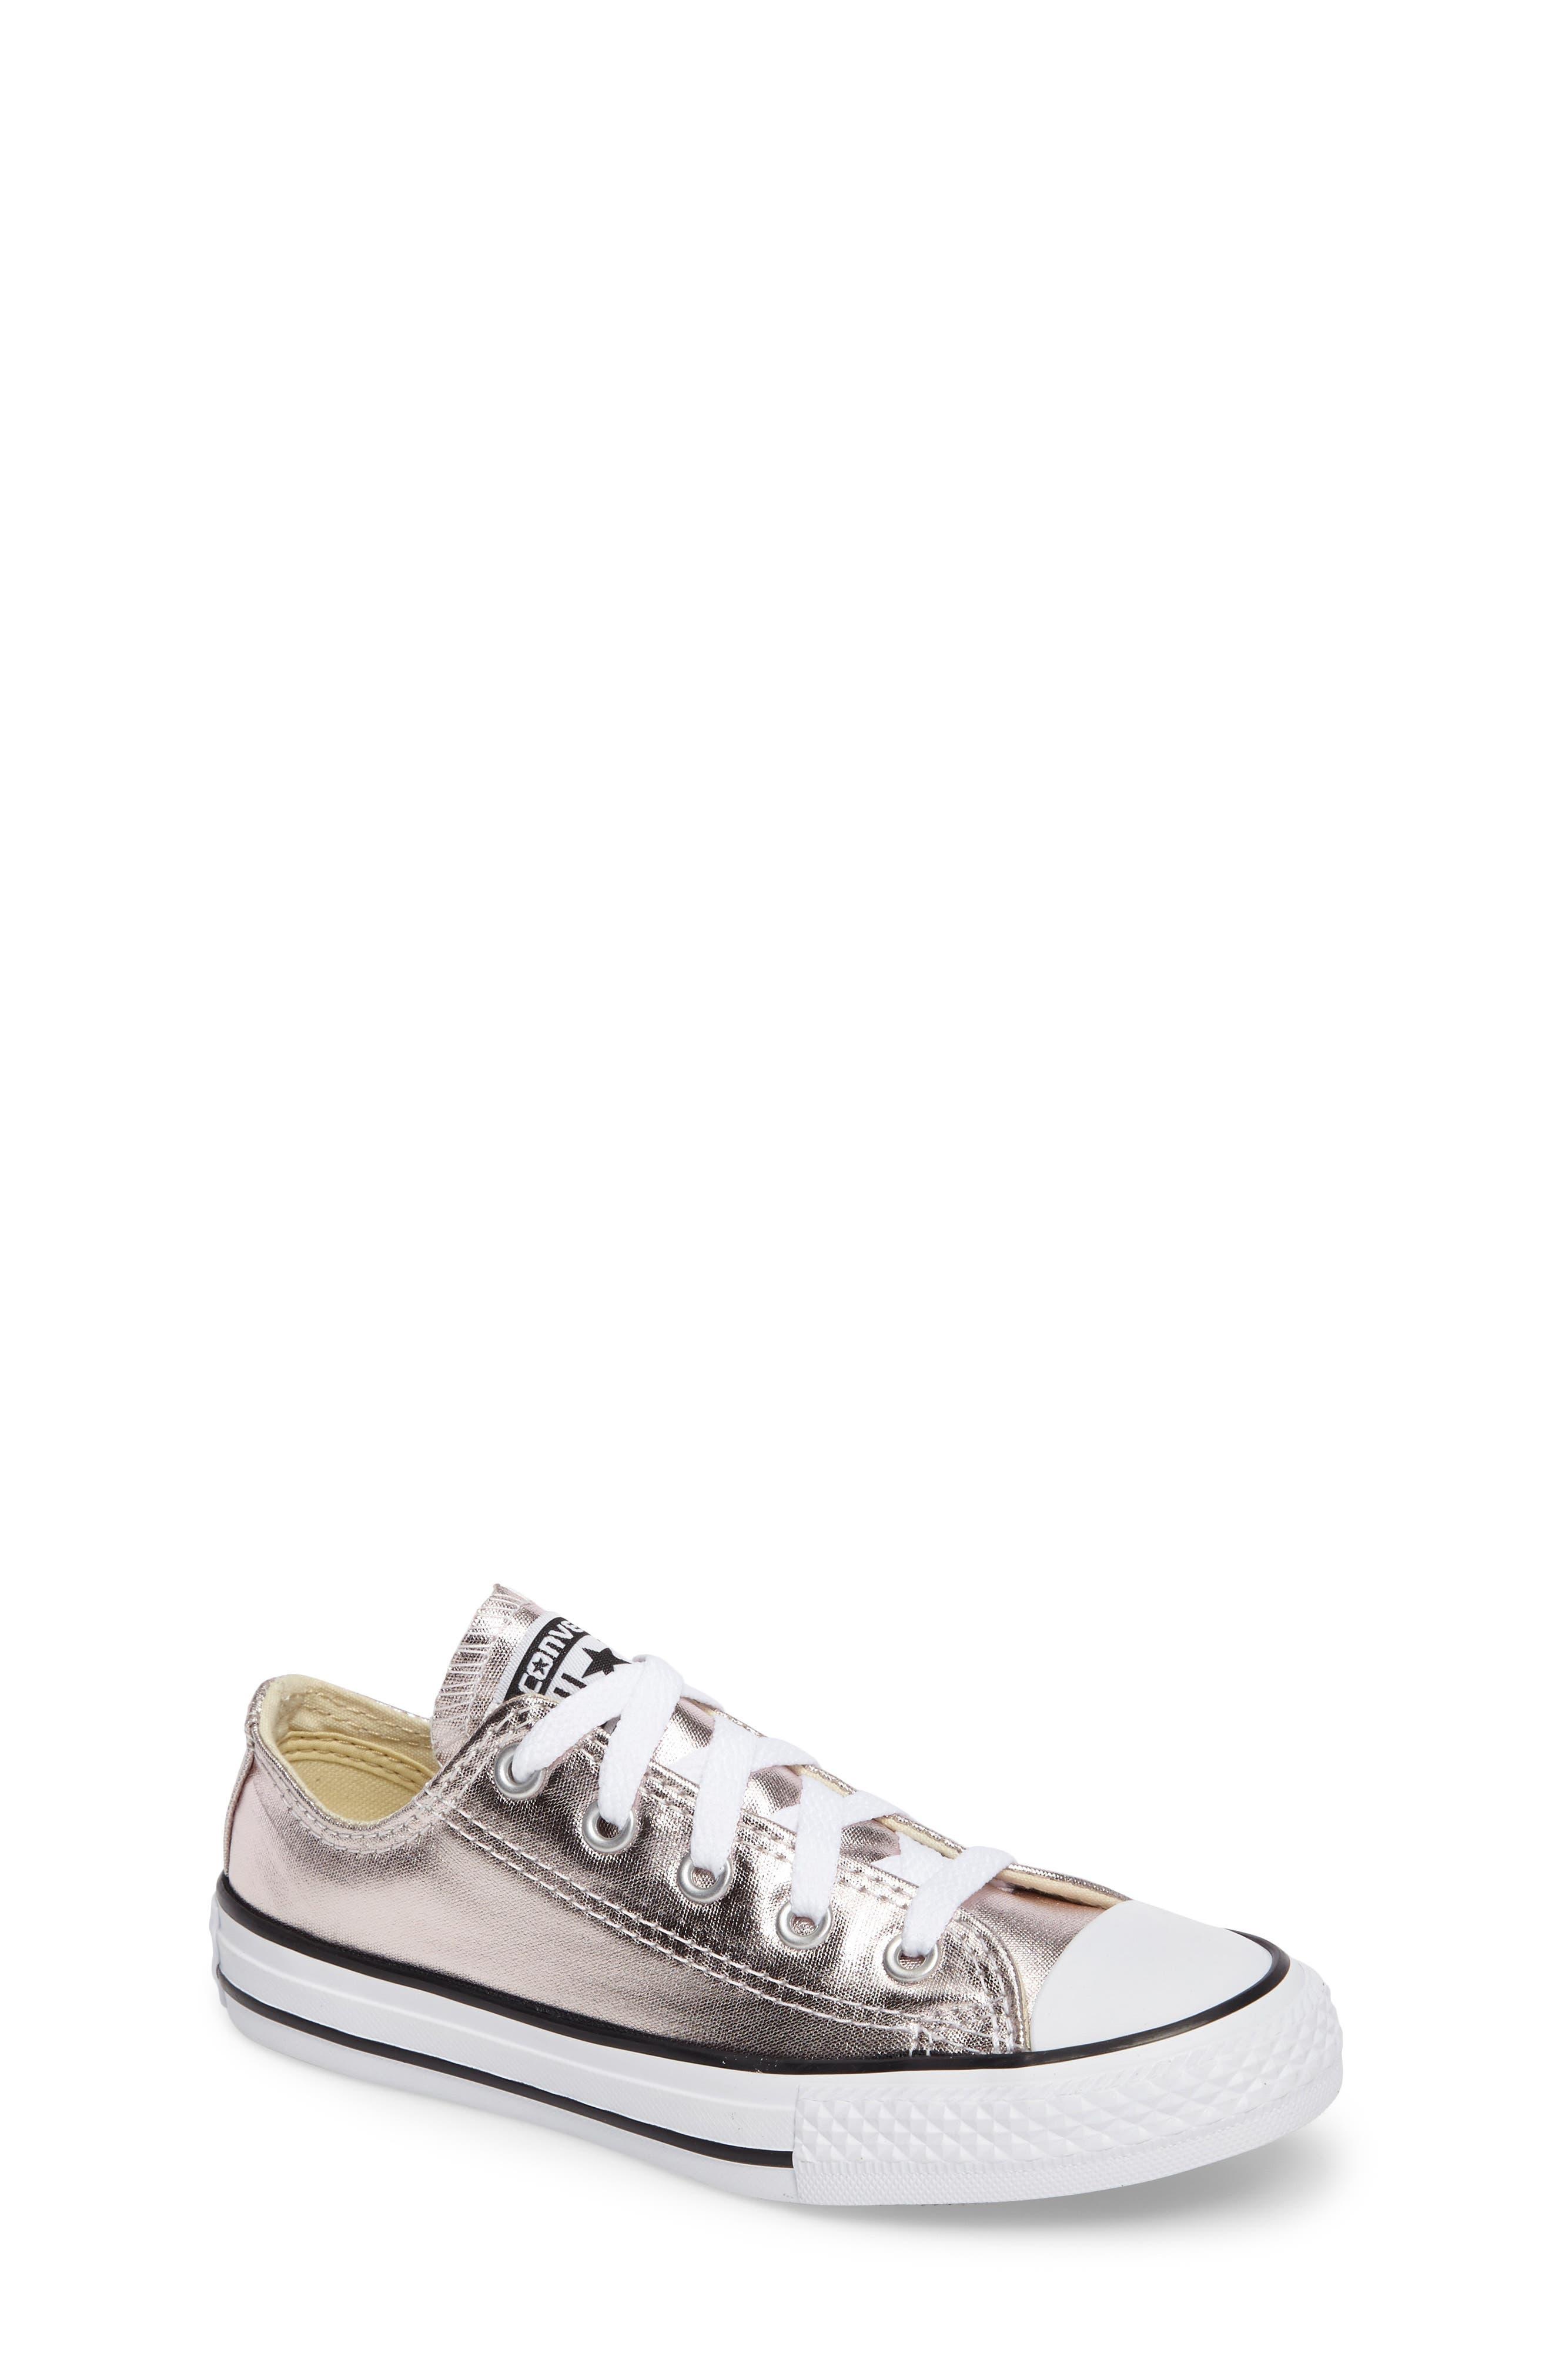 Converse Chuck Taylor® All Star® Ox Metallic Low Top Sneaker (Toddler & Little Kid)